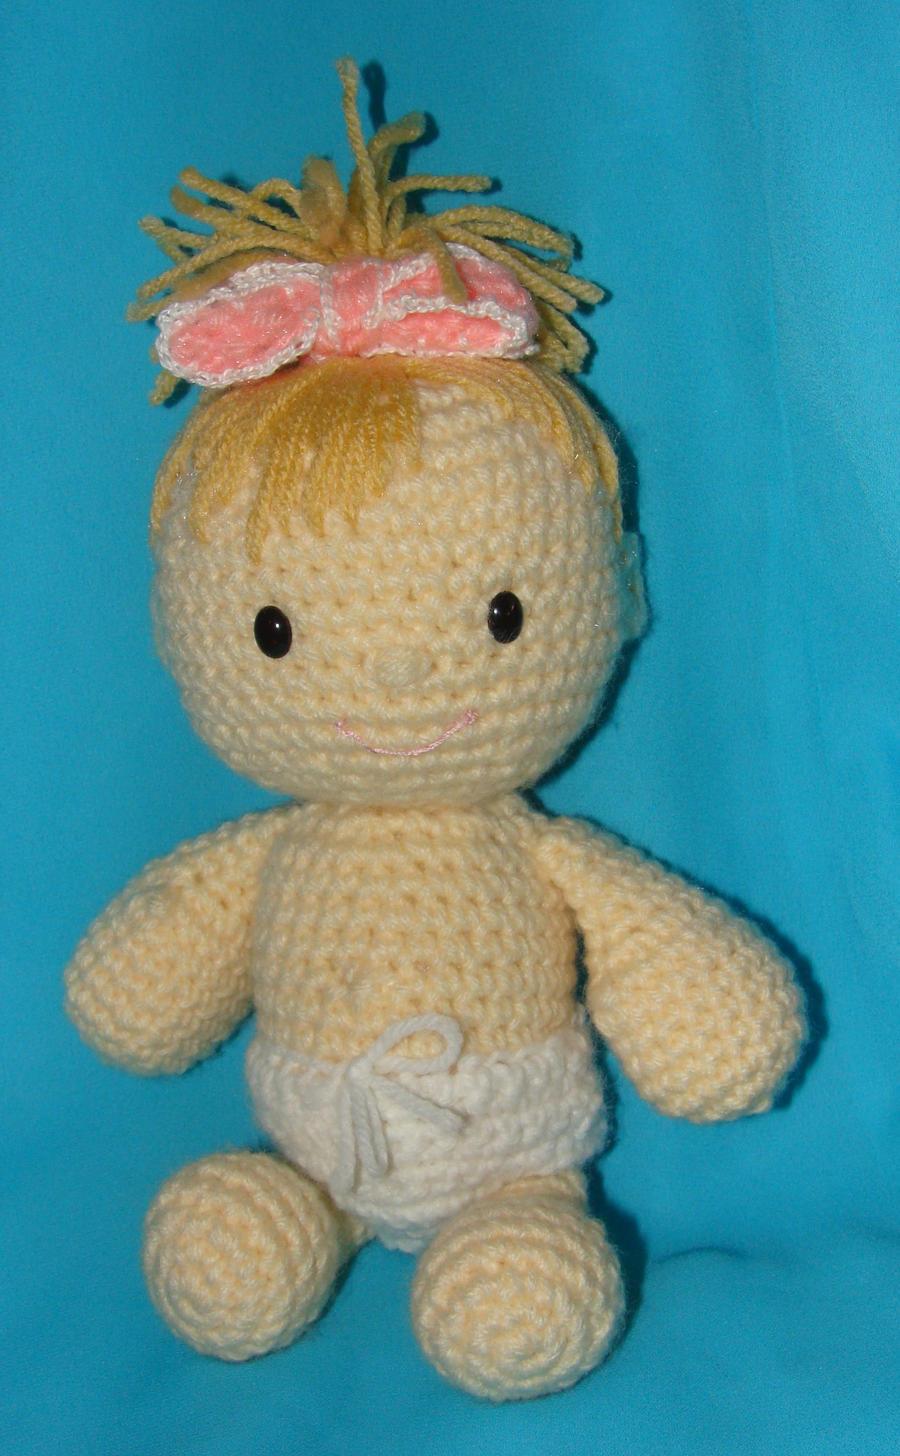 Amigurumi Baby Kostenlos : Amigurumi baby doll, sitting by Dragonlady92768 on DeviantArt